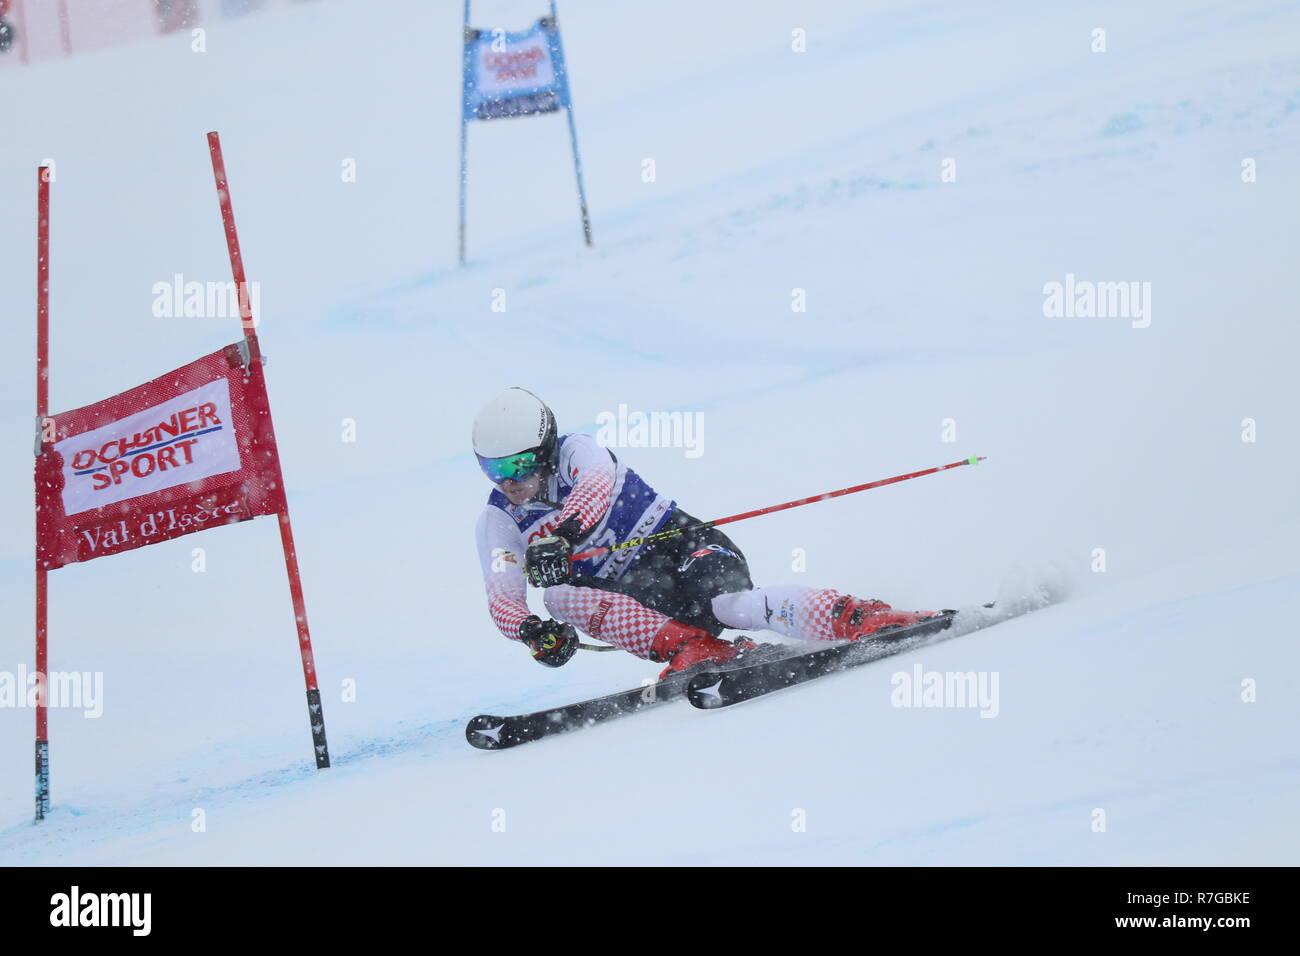 Zubcic Filip Croatia competing in Val d'Isère men's Giant slalom Audi Fis Alpine Ski World Cup 2019 - Stock Image